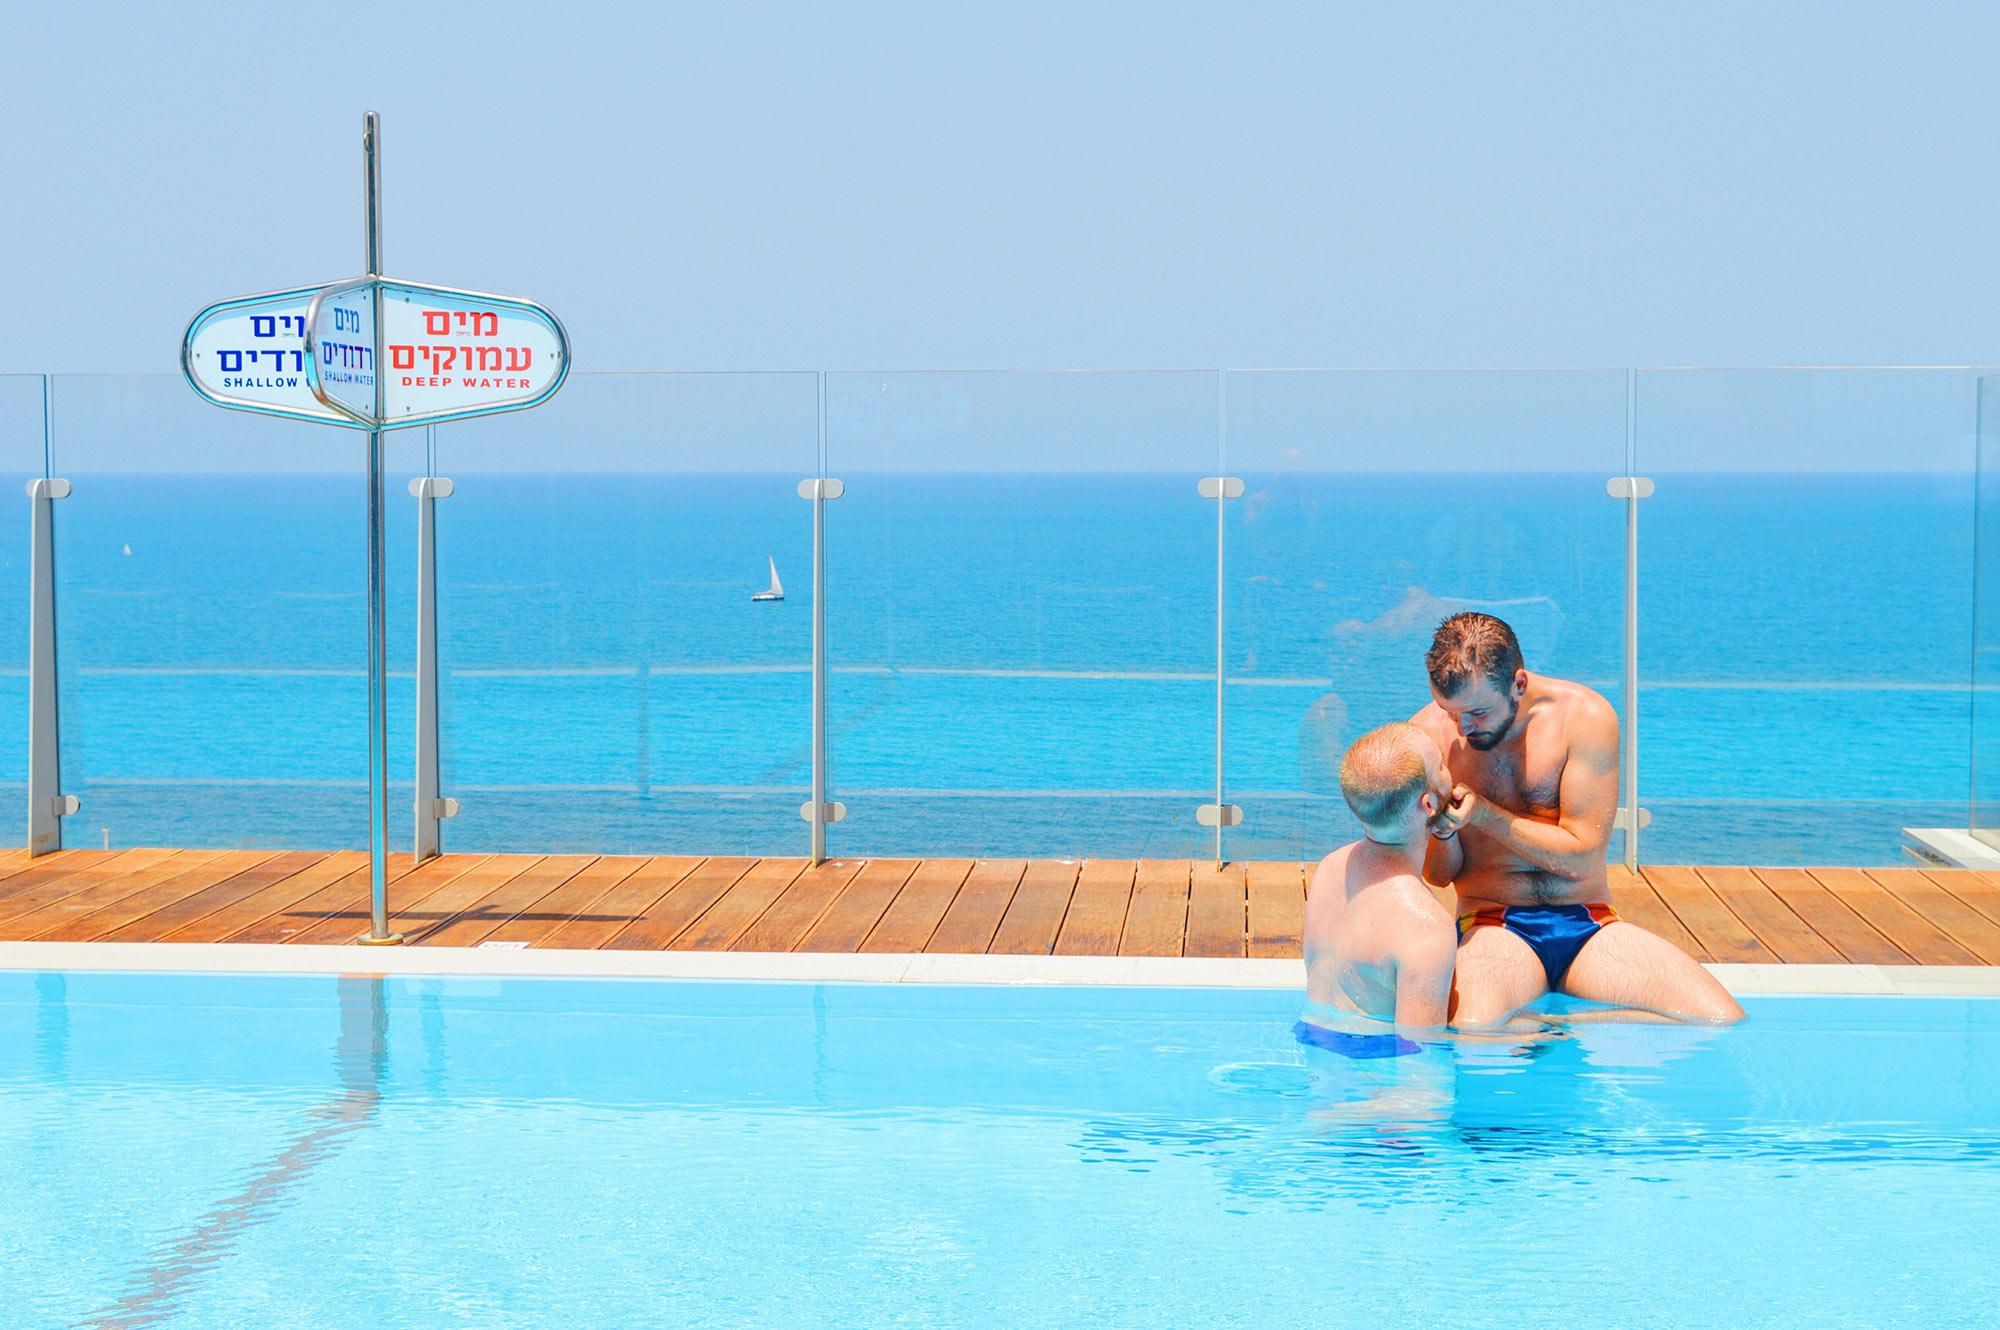 Gay-friendly Carlton Beach Tel Aviv Carlton Beach Hotel Tel Aviv Israel gay-friendly © CoupleofMen.com